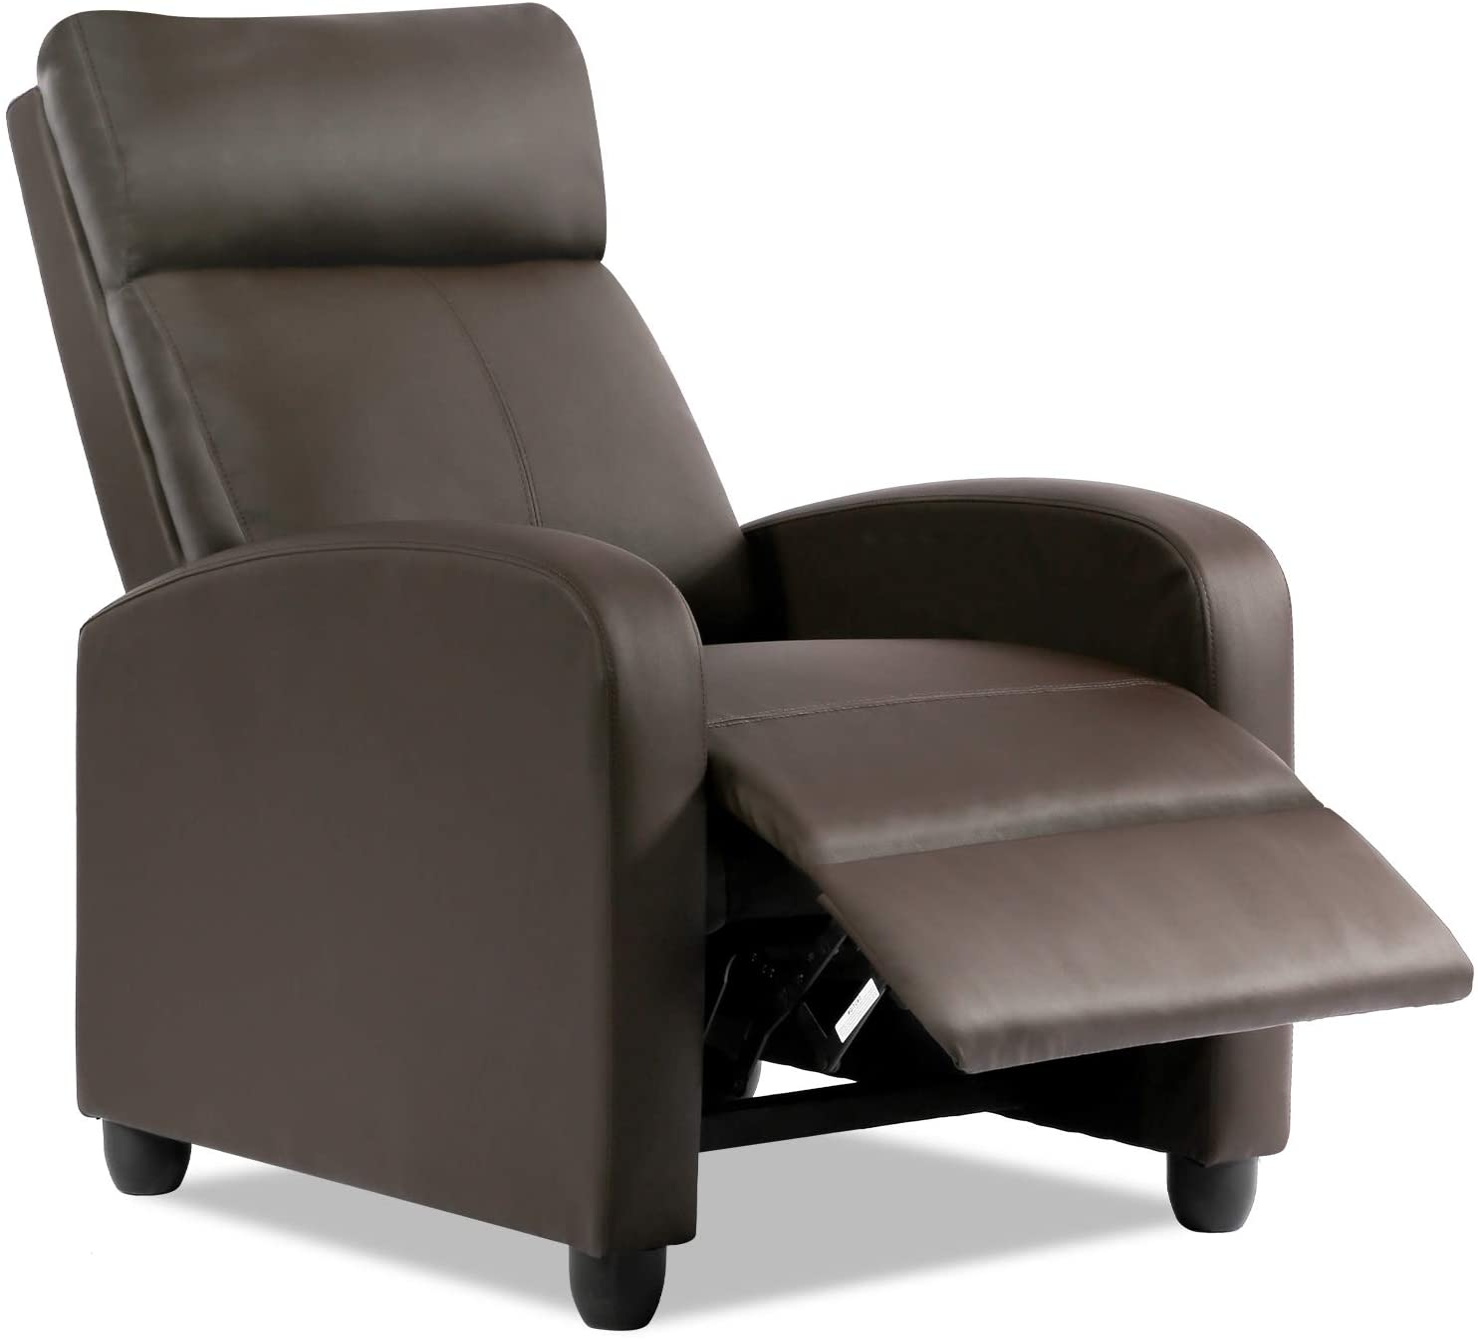 Vnewone sx102-brown Recliner Chair, Brown